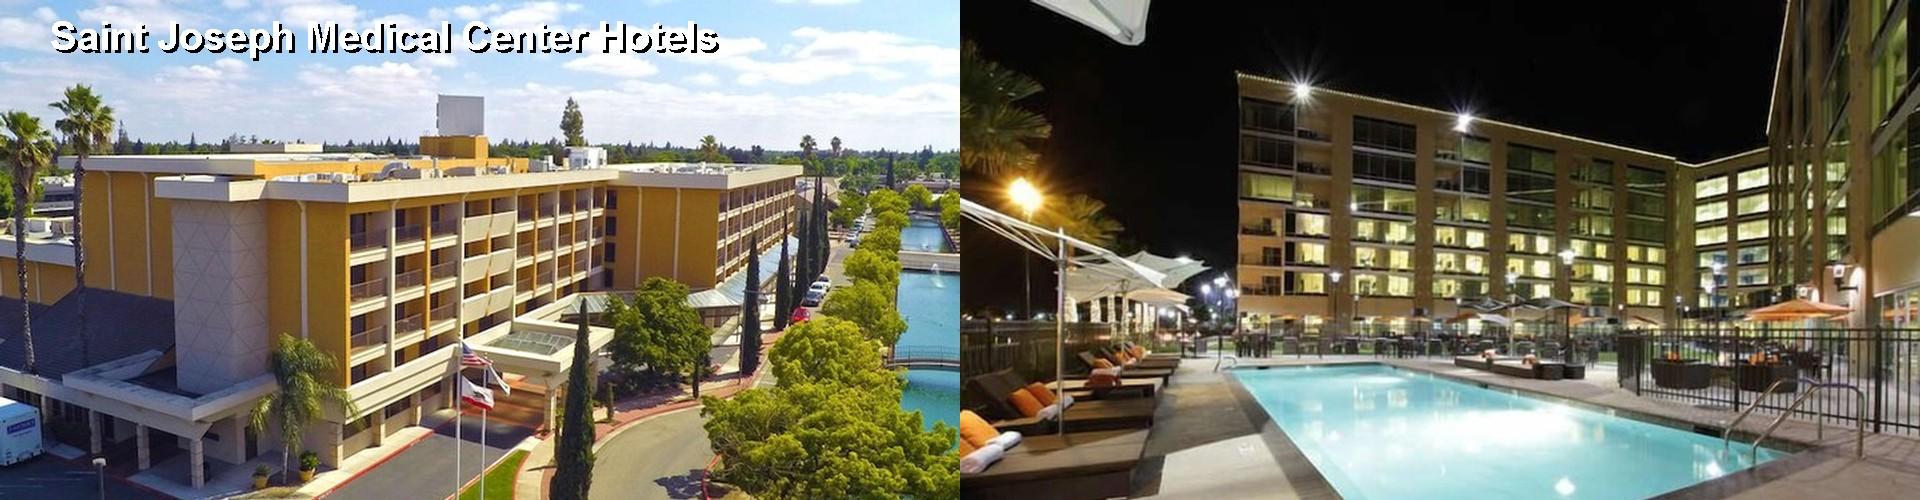 5 Best Hotels Near Saint Joseph Medical Center